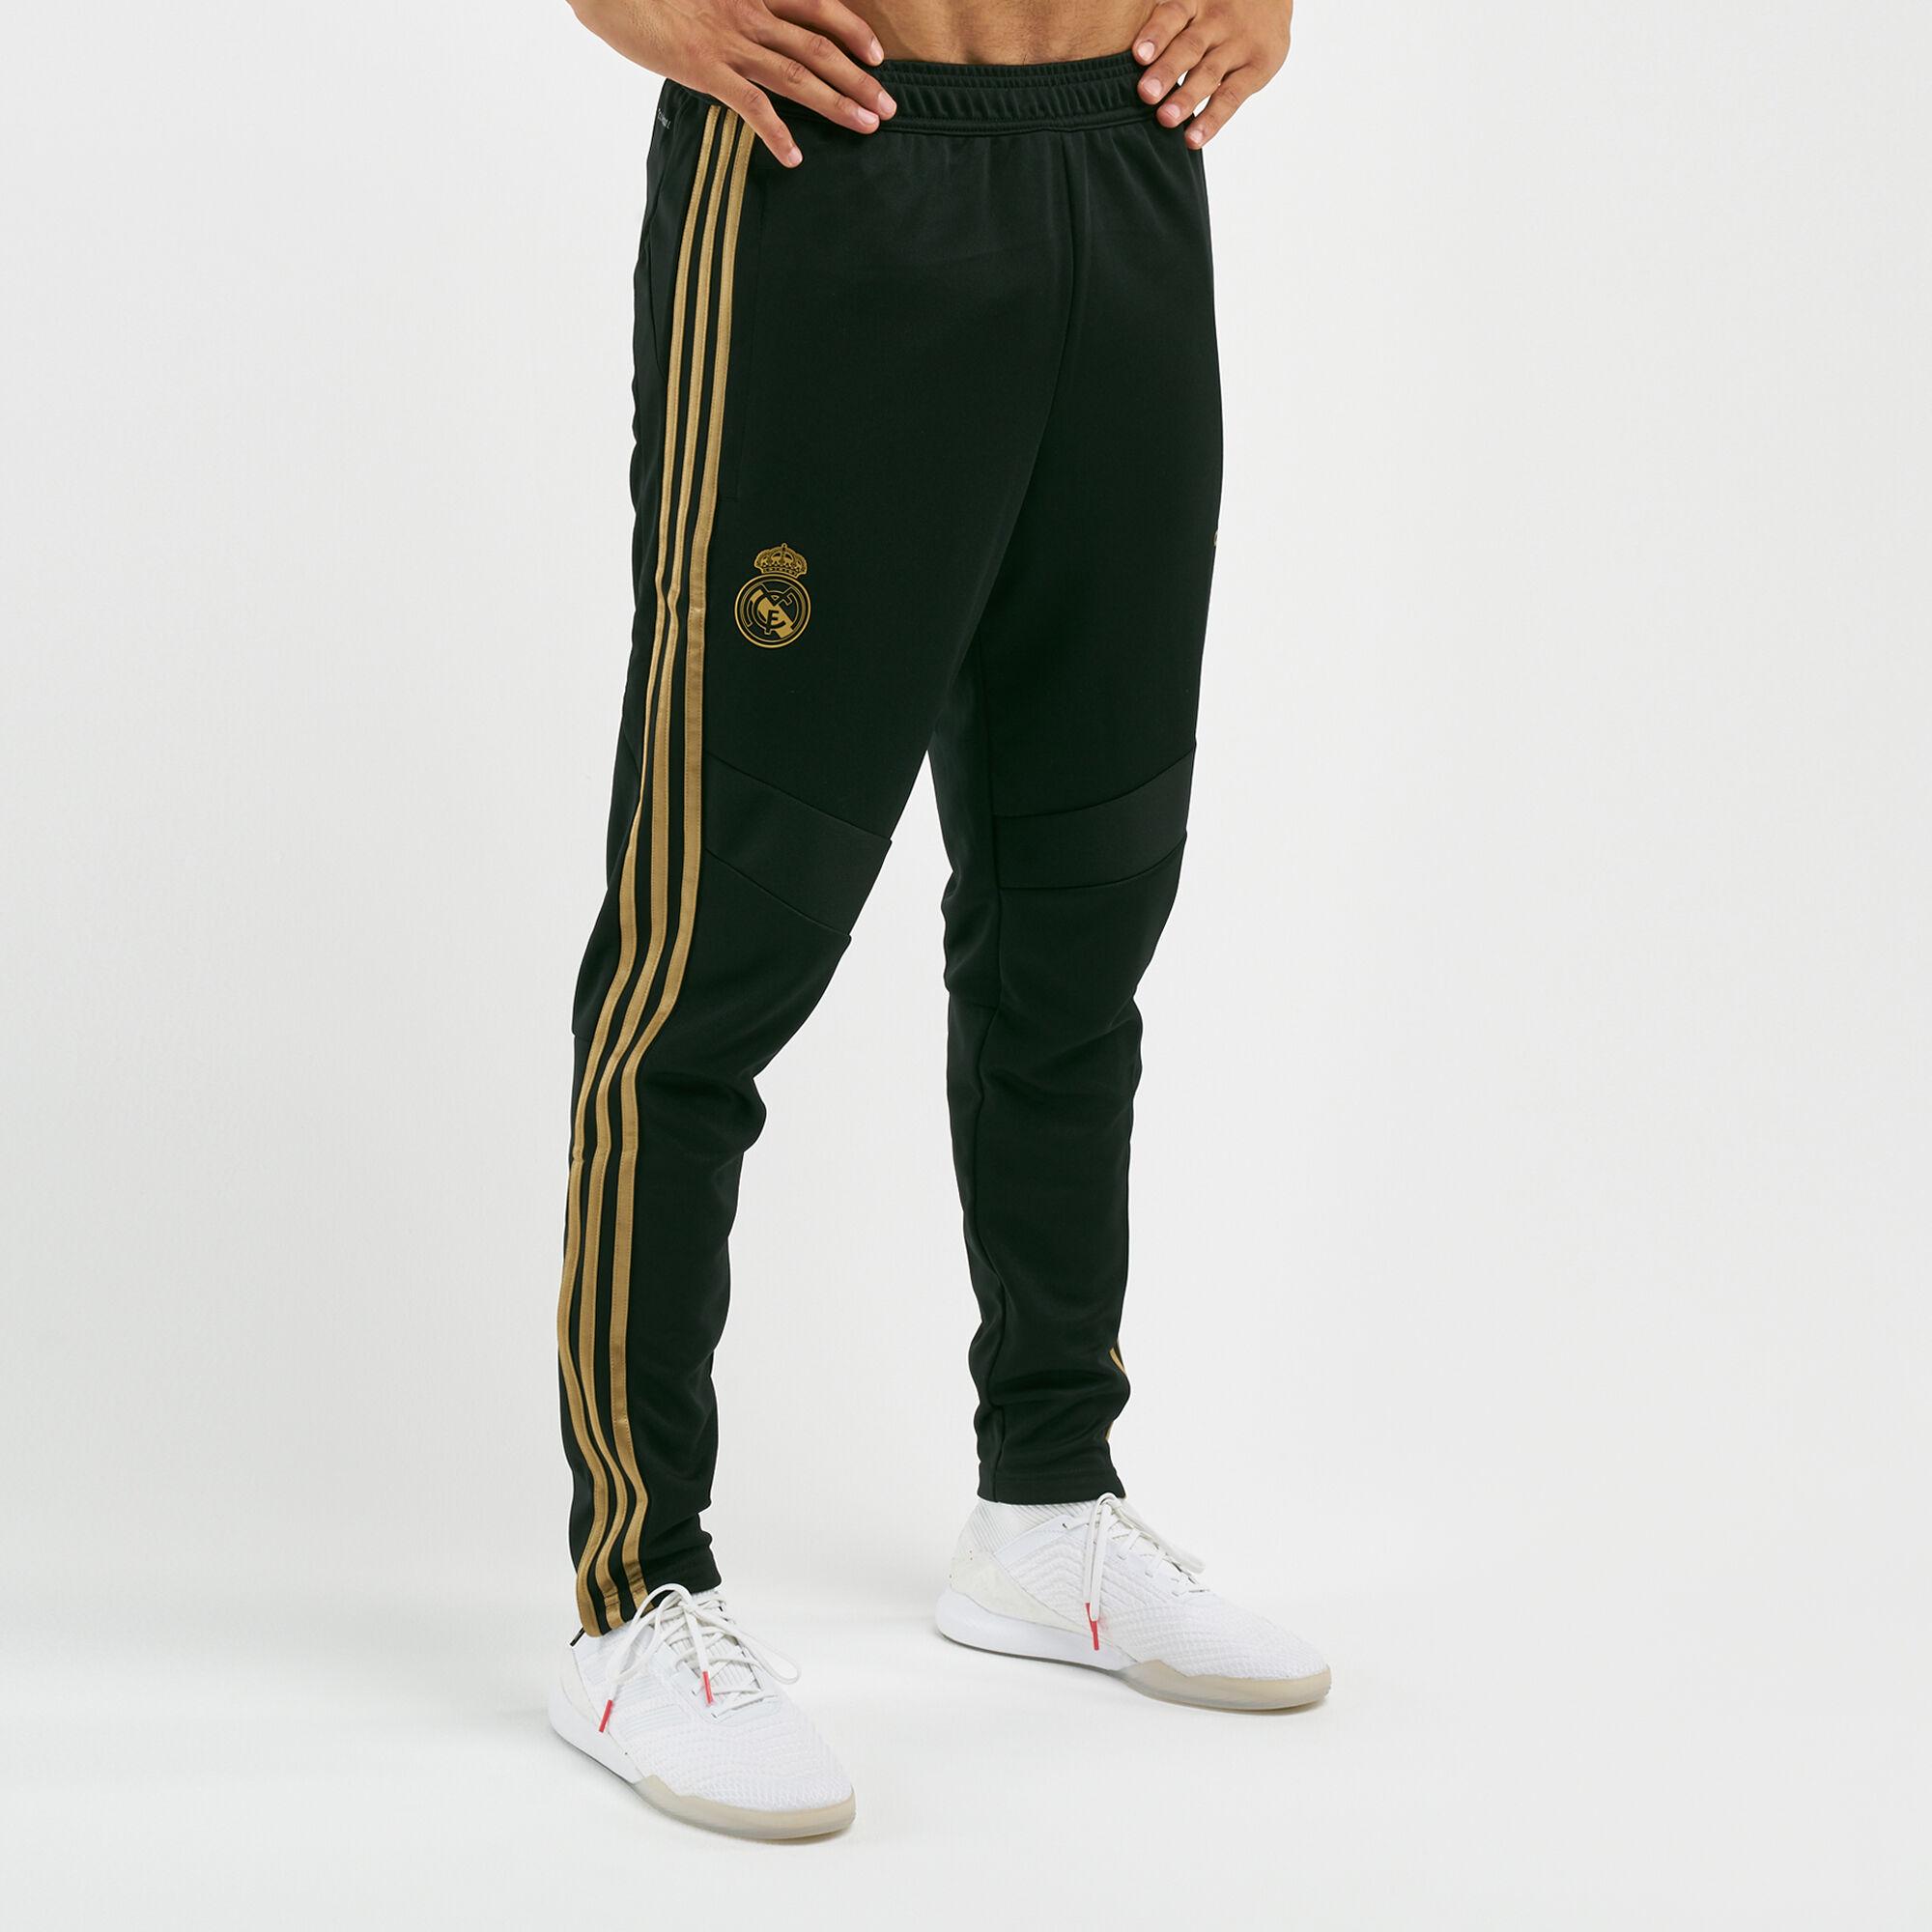 maduro Atar patrón  Buy adidas Men's Real Madrid Football Training Pants in Dubai, UAE | SSS